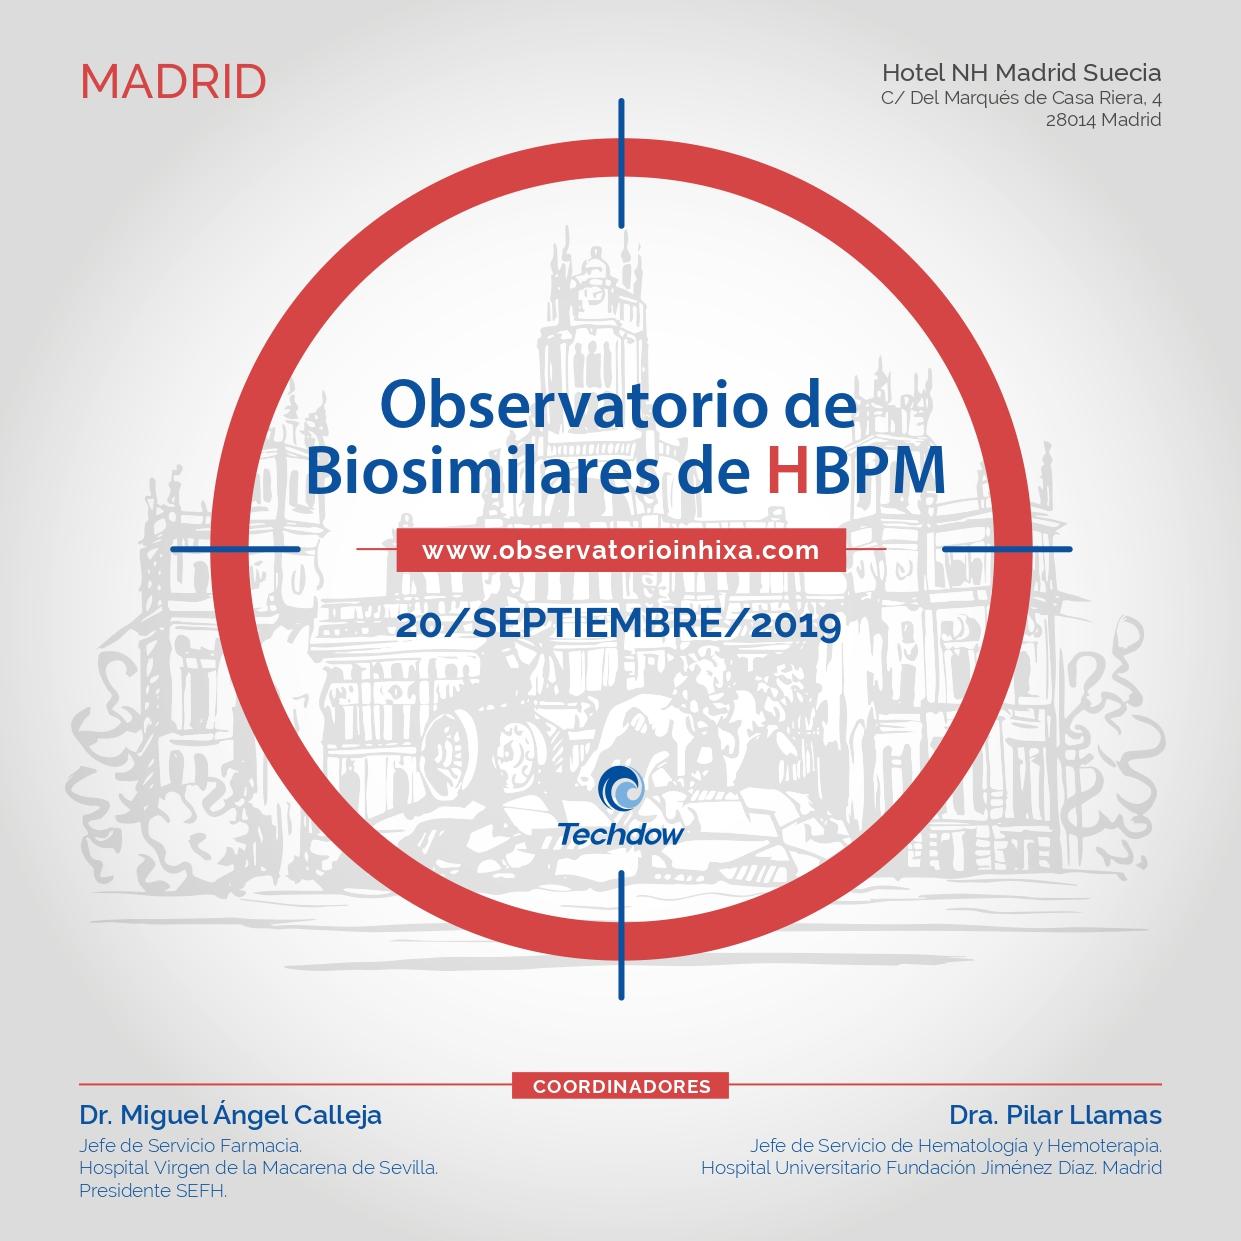 Observatorio de Biosimilares HBPM